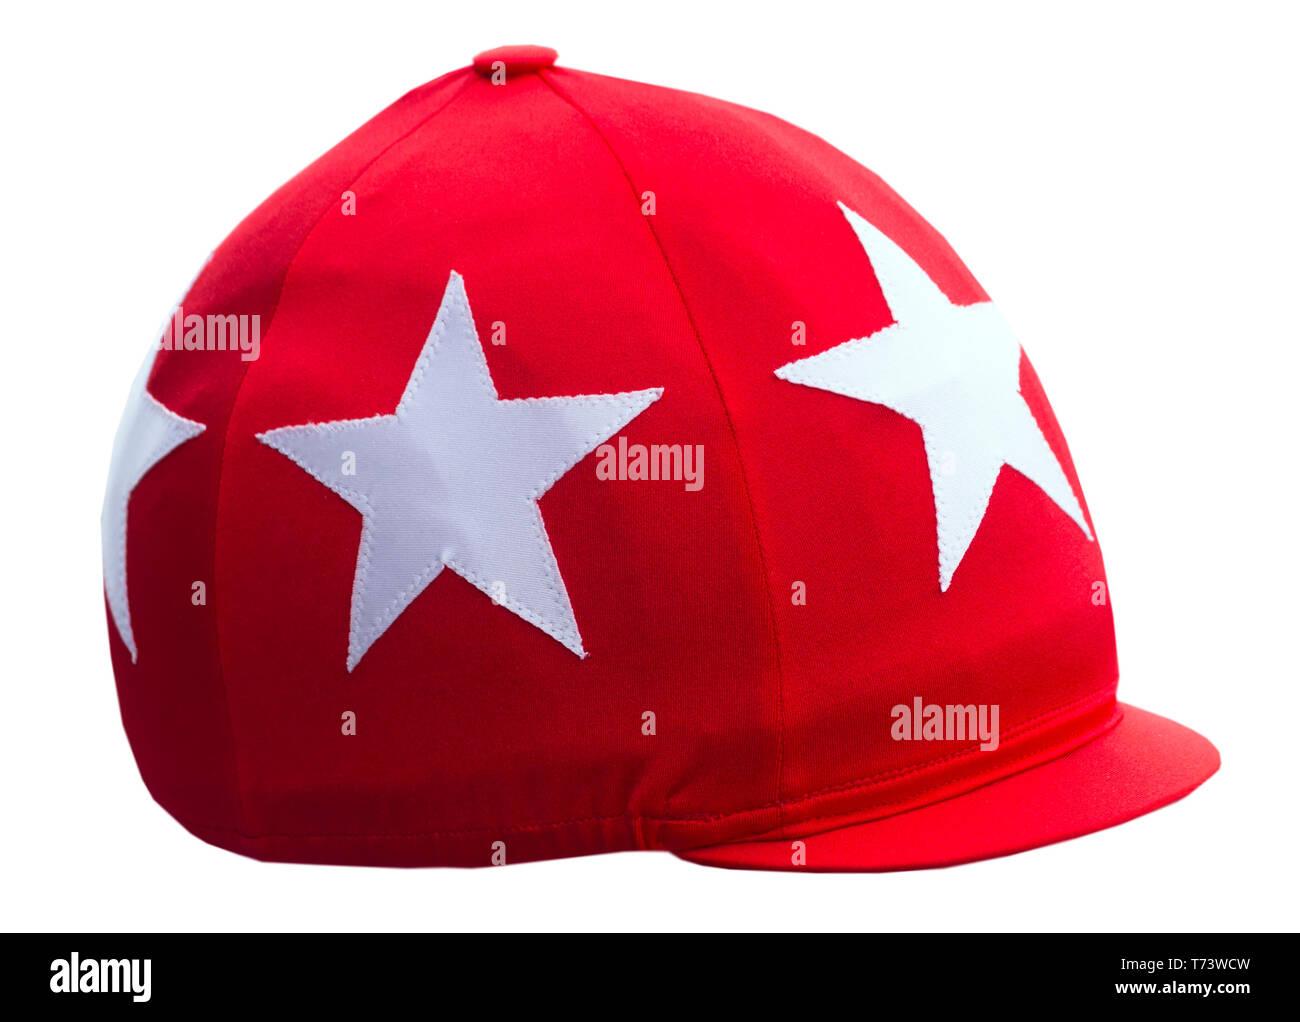 Jockey's headdress, red round cap with visor isolated on white background. - Stock Image